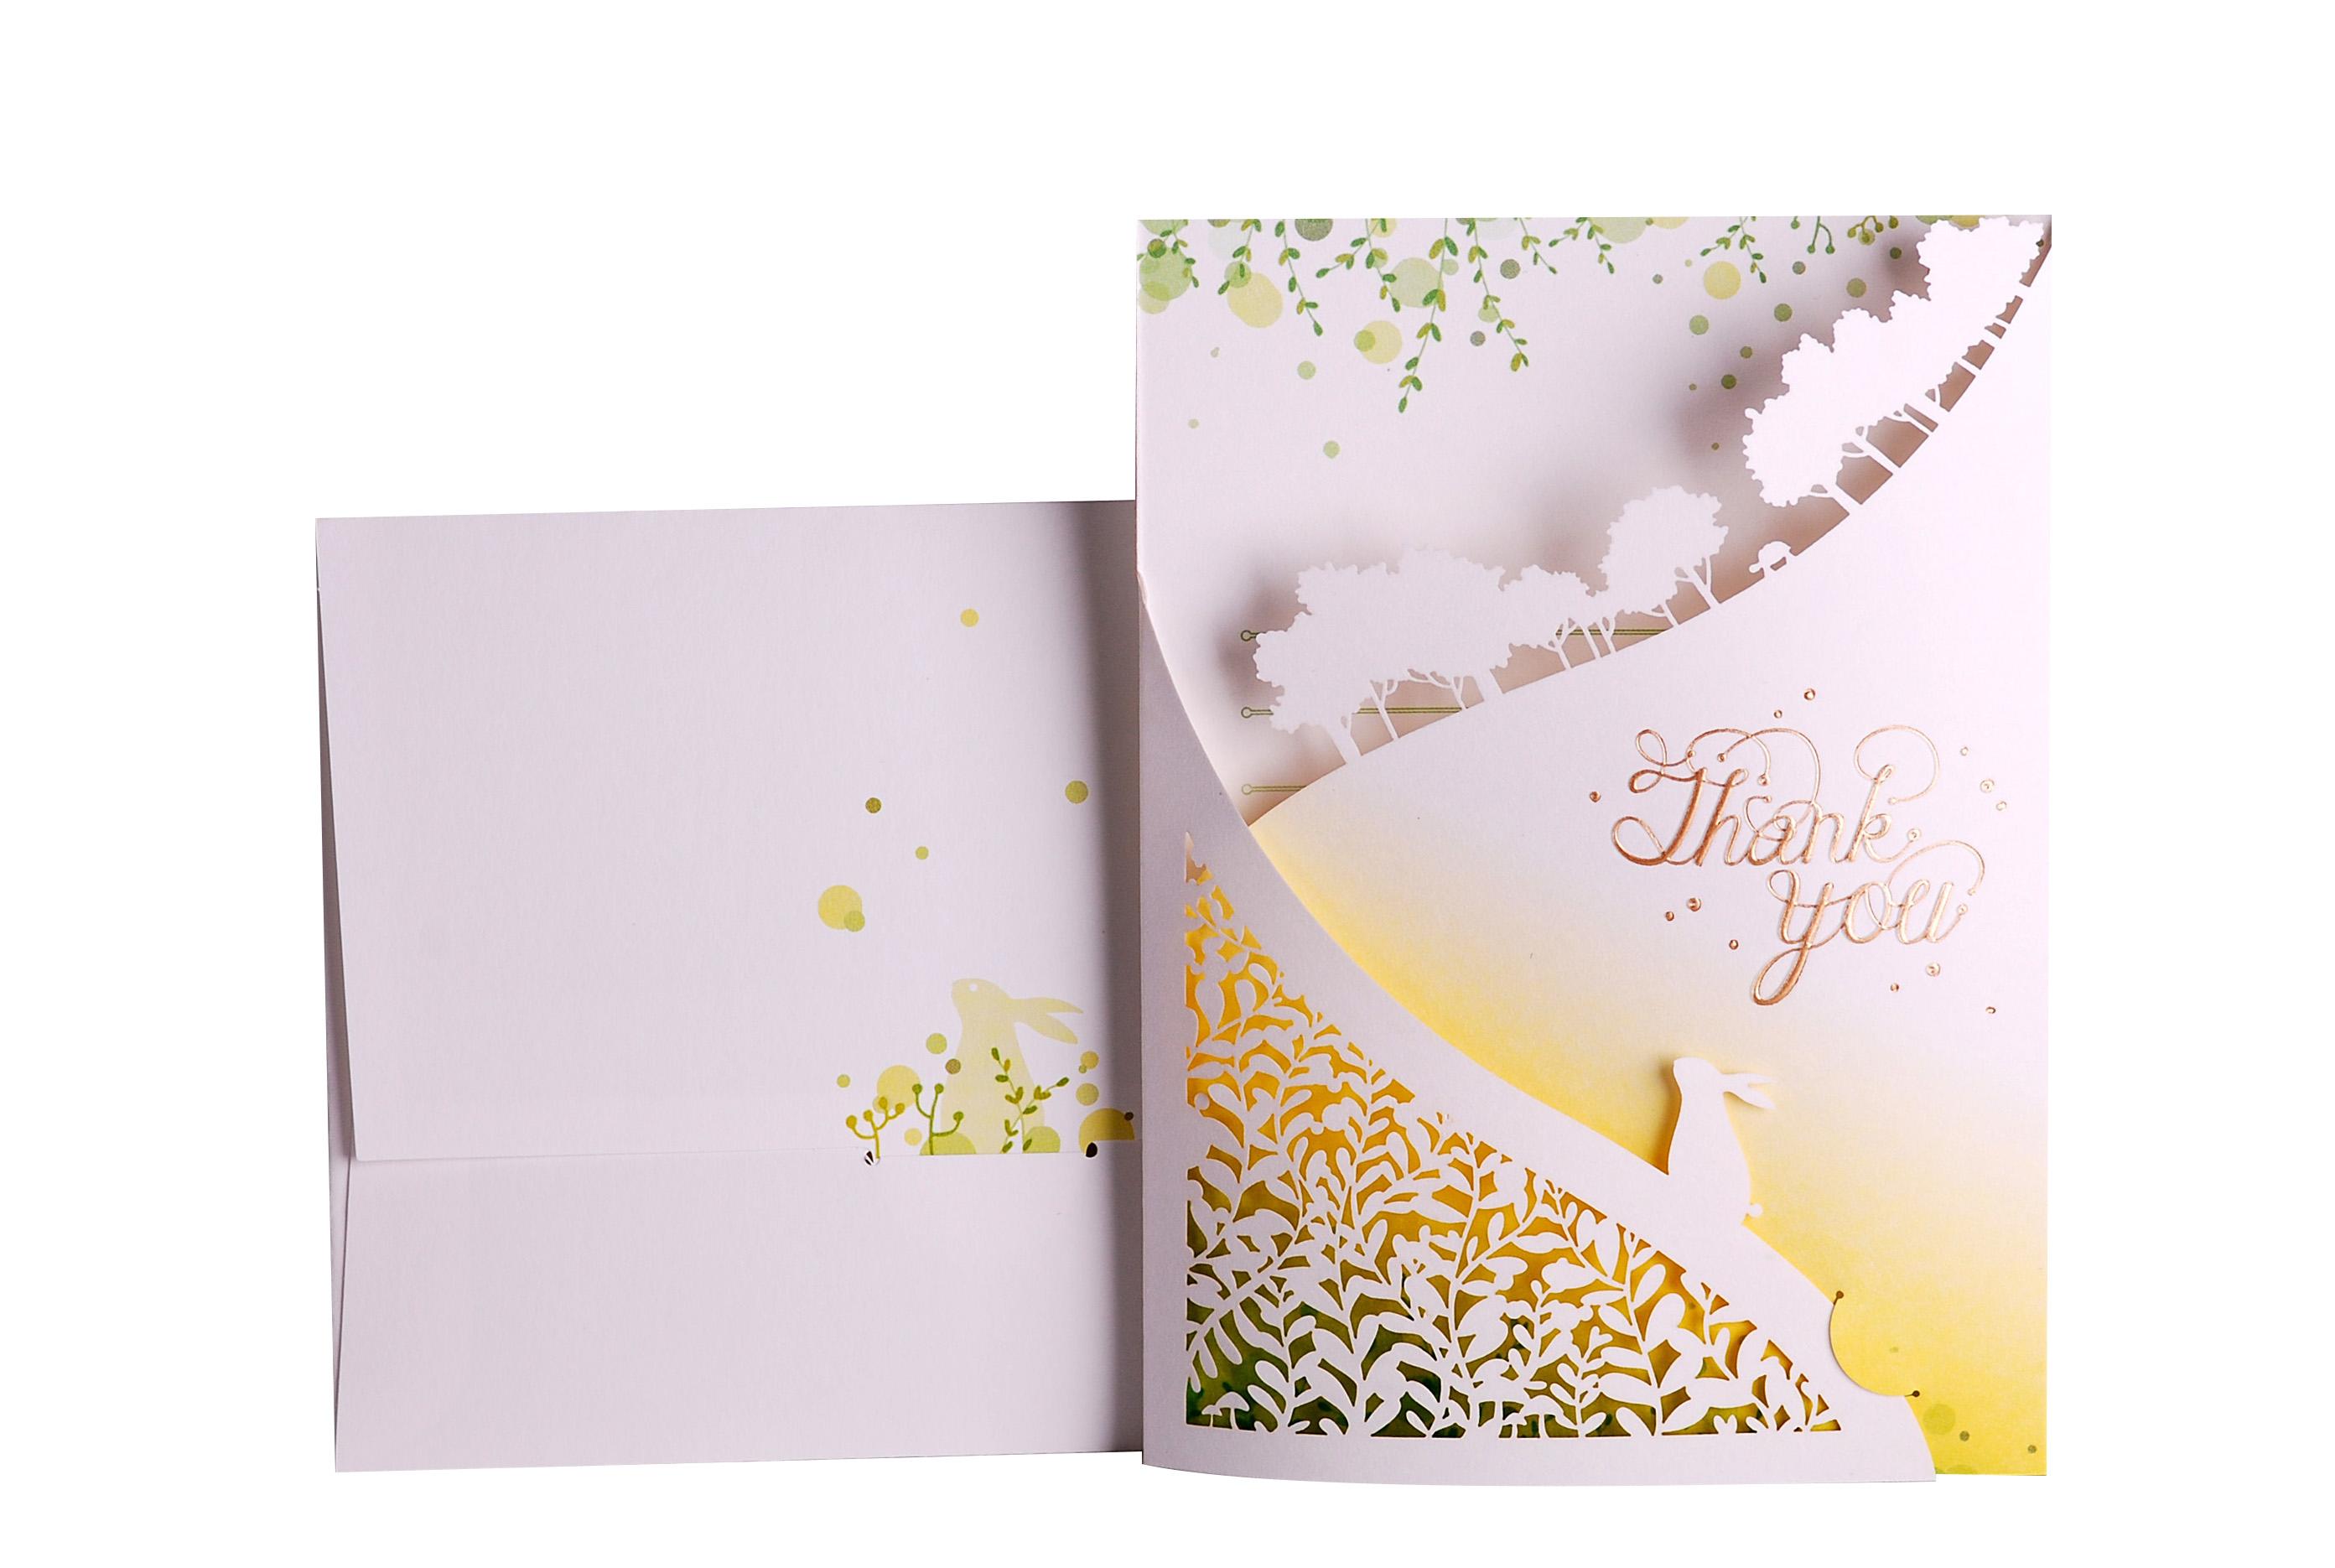 Bon design laser cut card set card and envelop flower card set lac21 laser cut thank you card envelopes greeting card setg kristyandbryce Choice Image